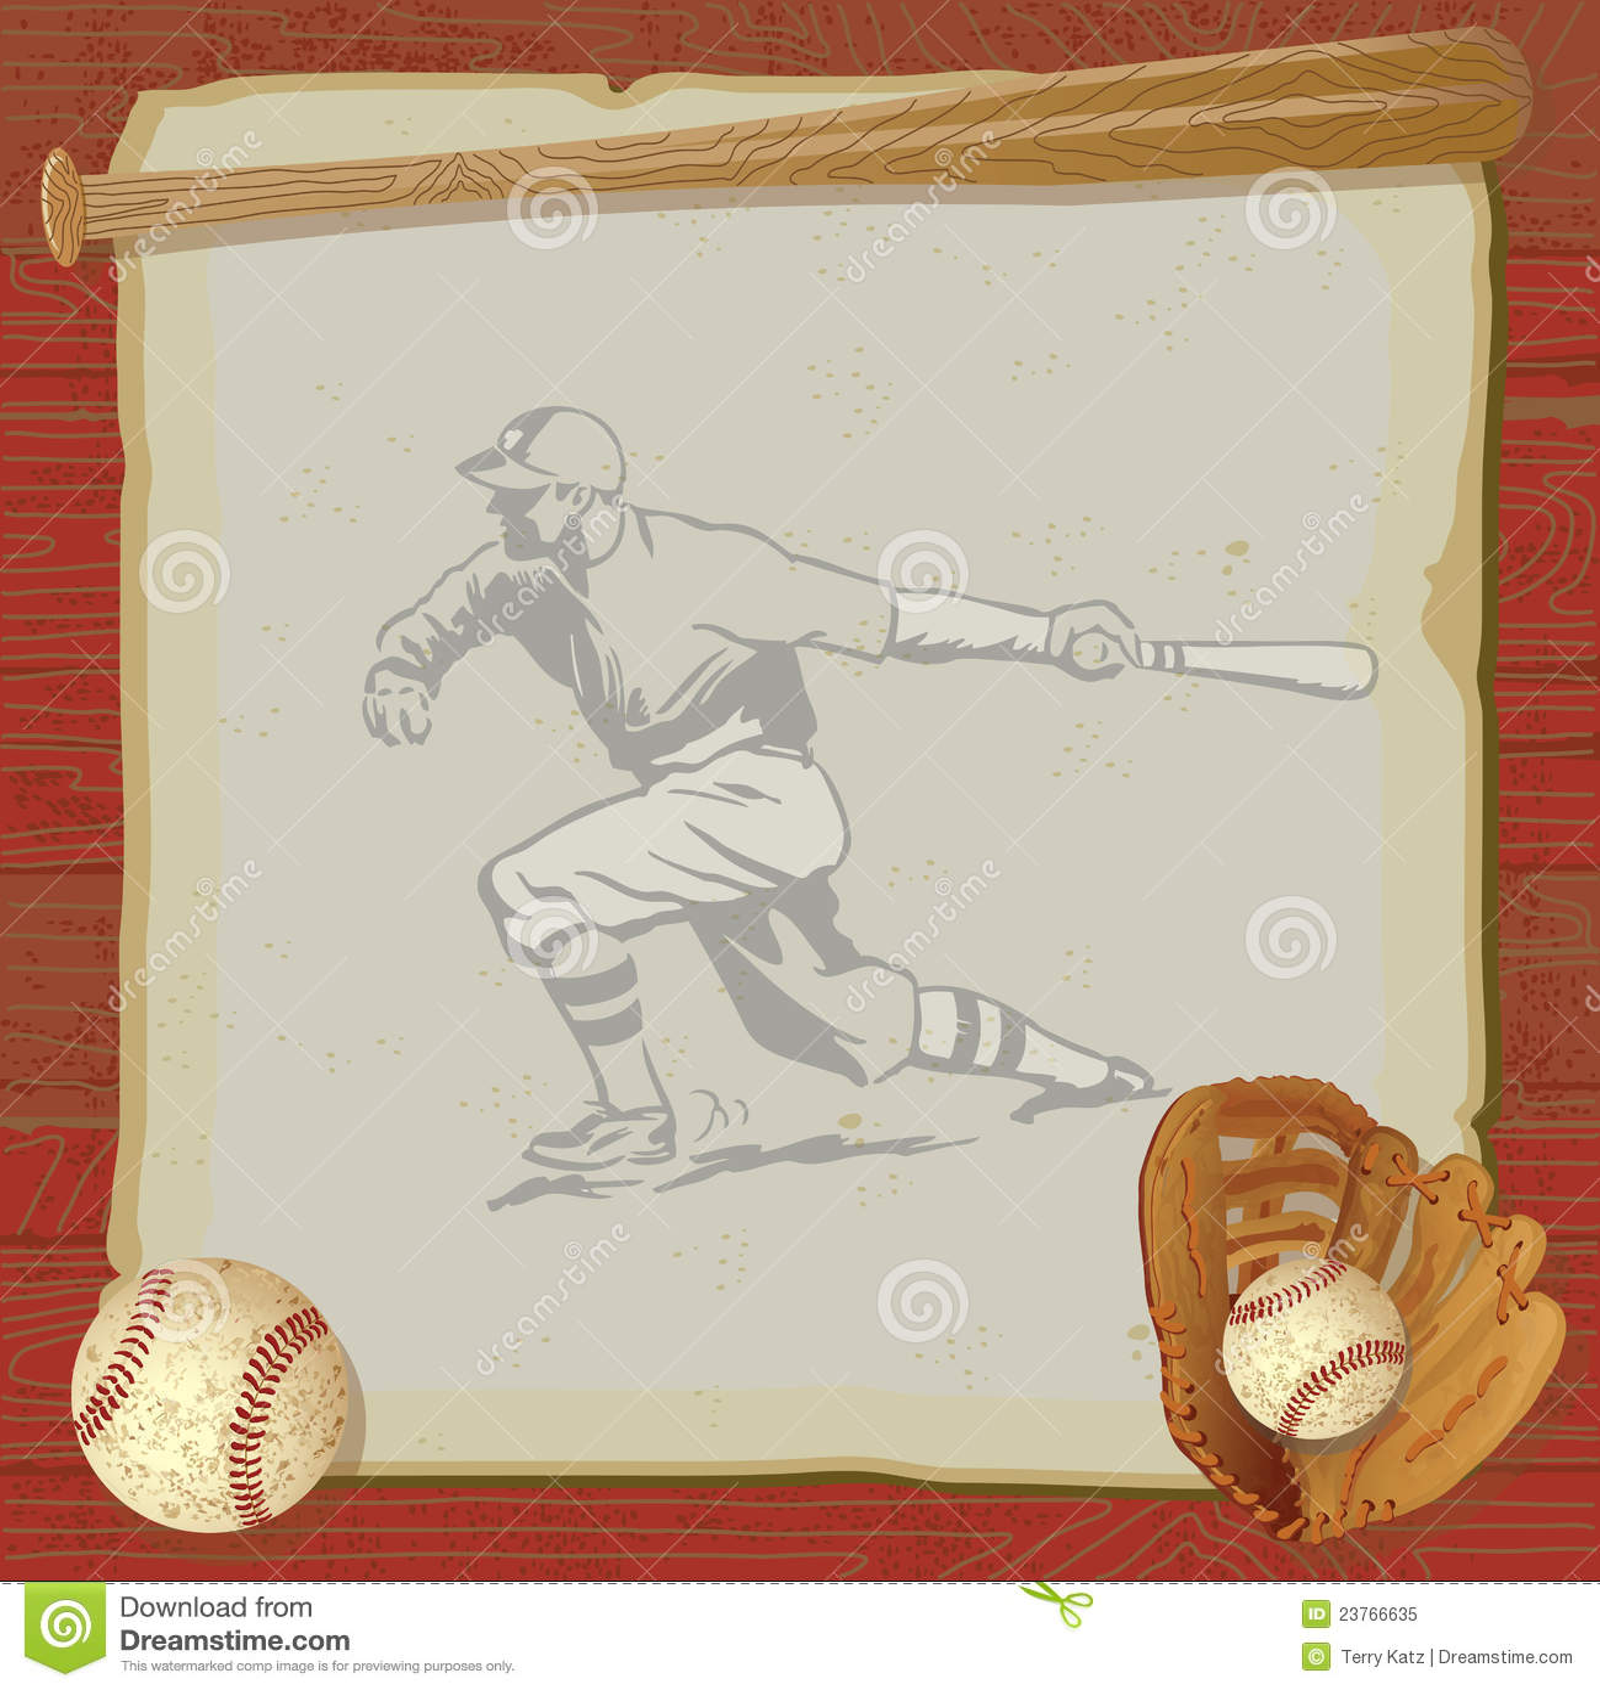 vintage baseball party invitation card stock vector illustration